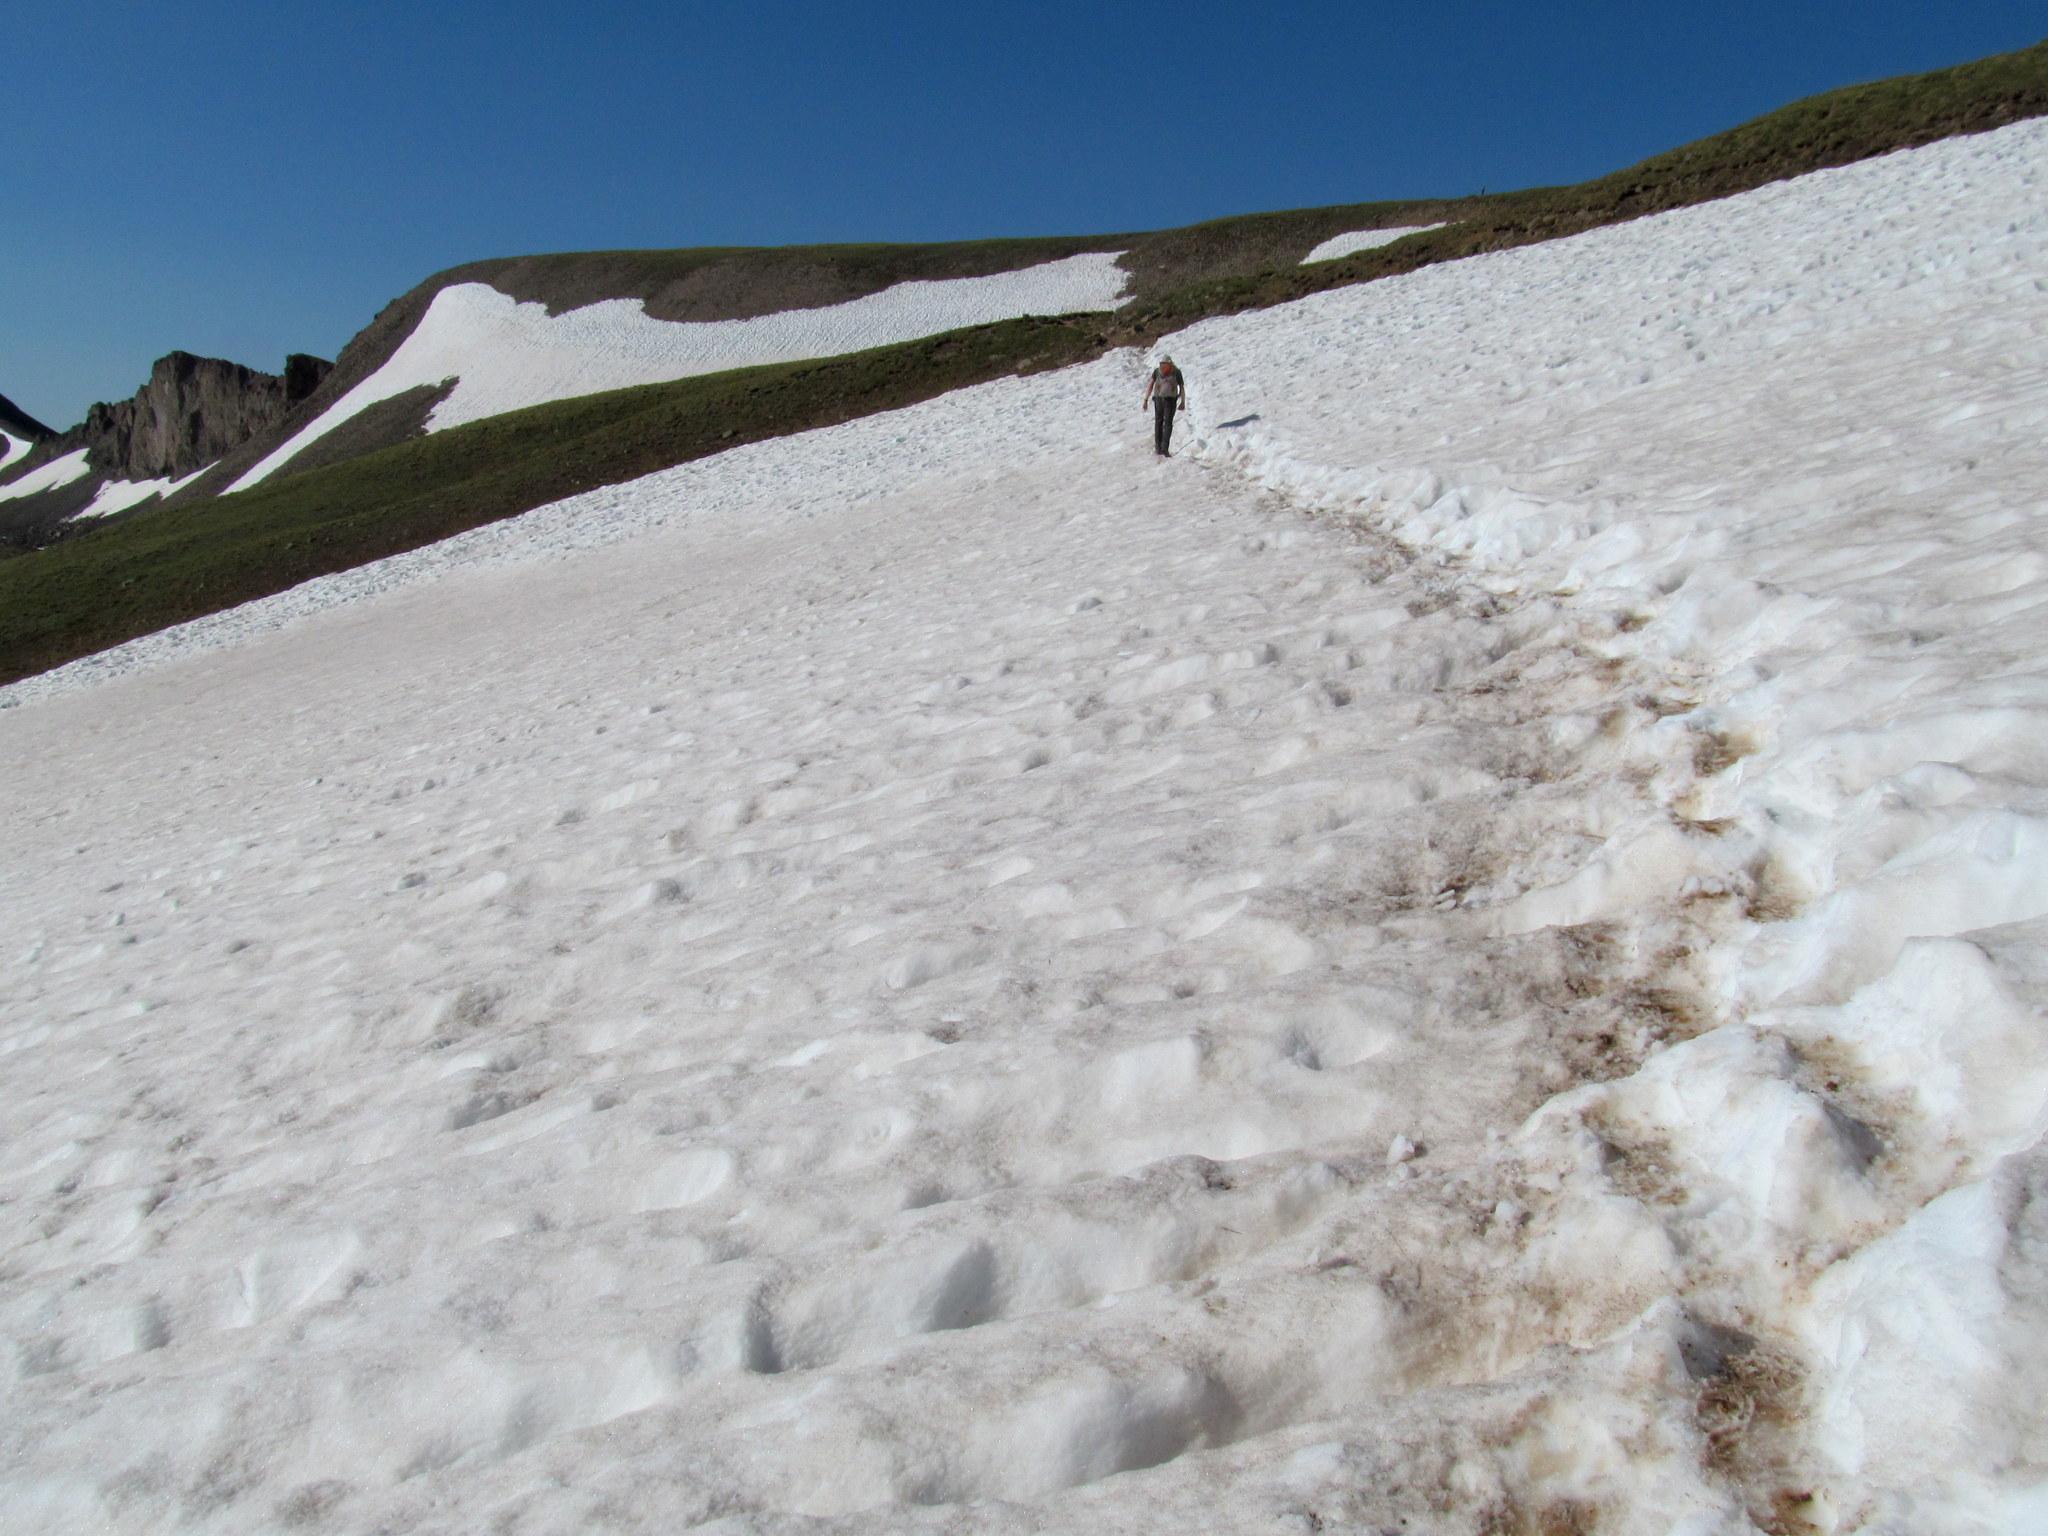 Photo: Crossing a snow field